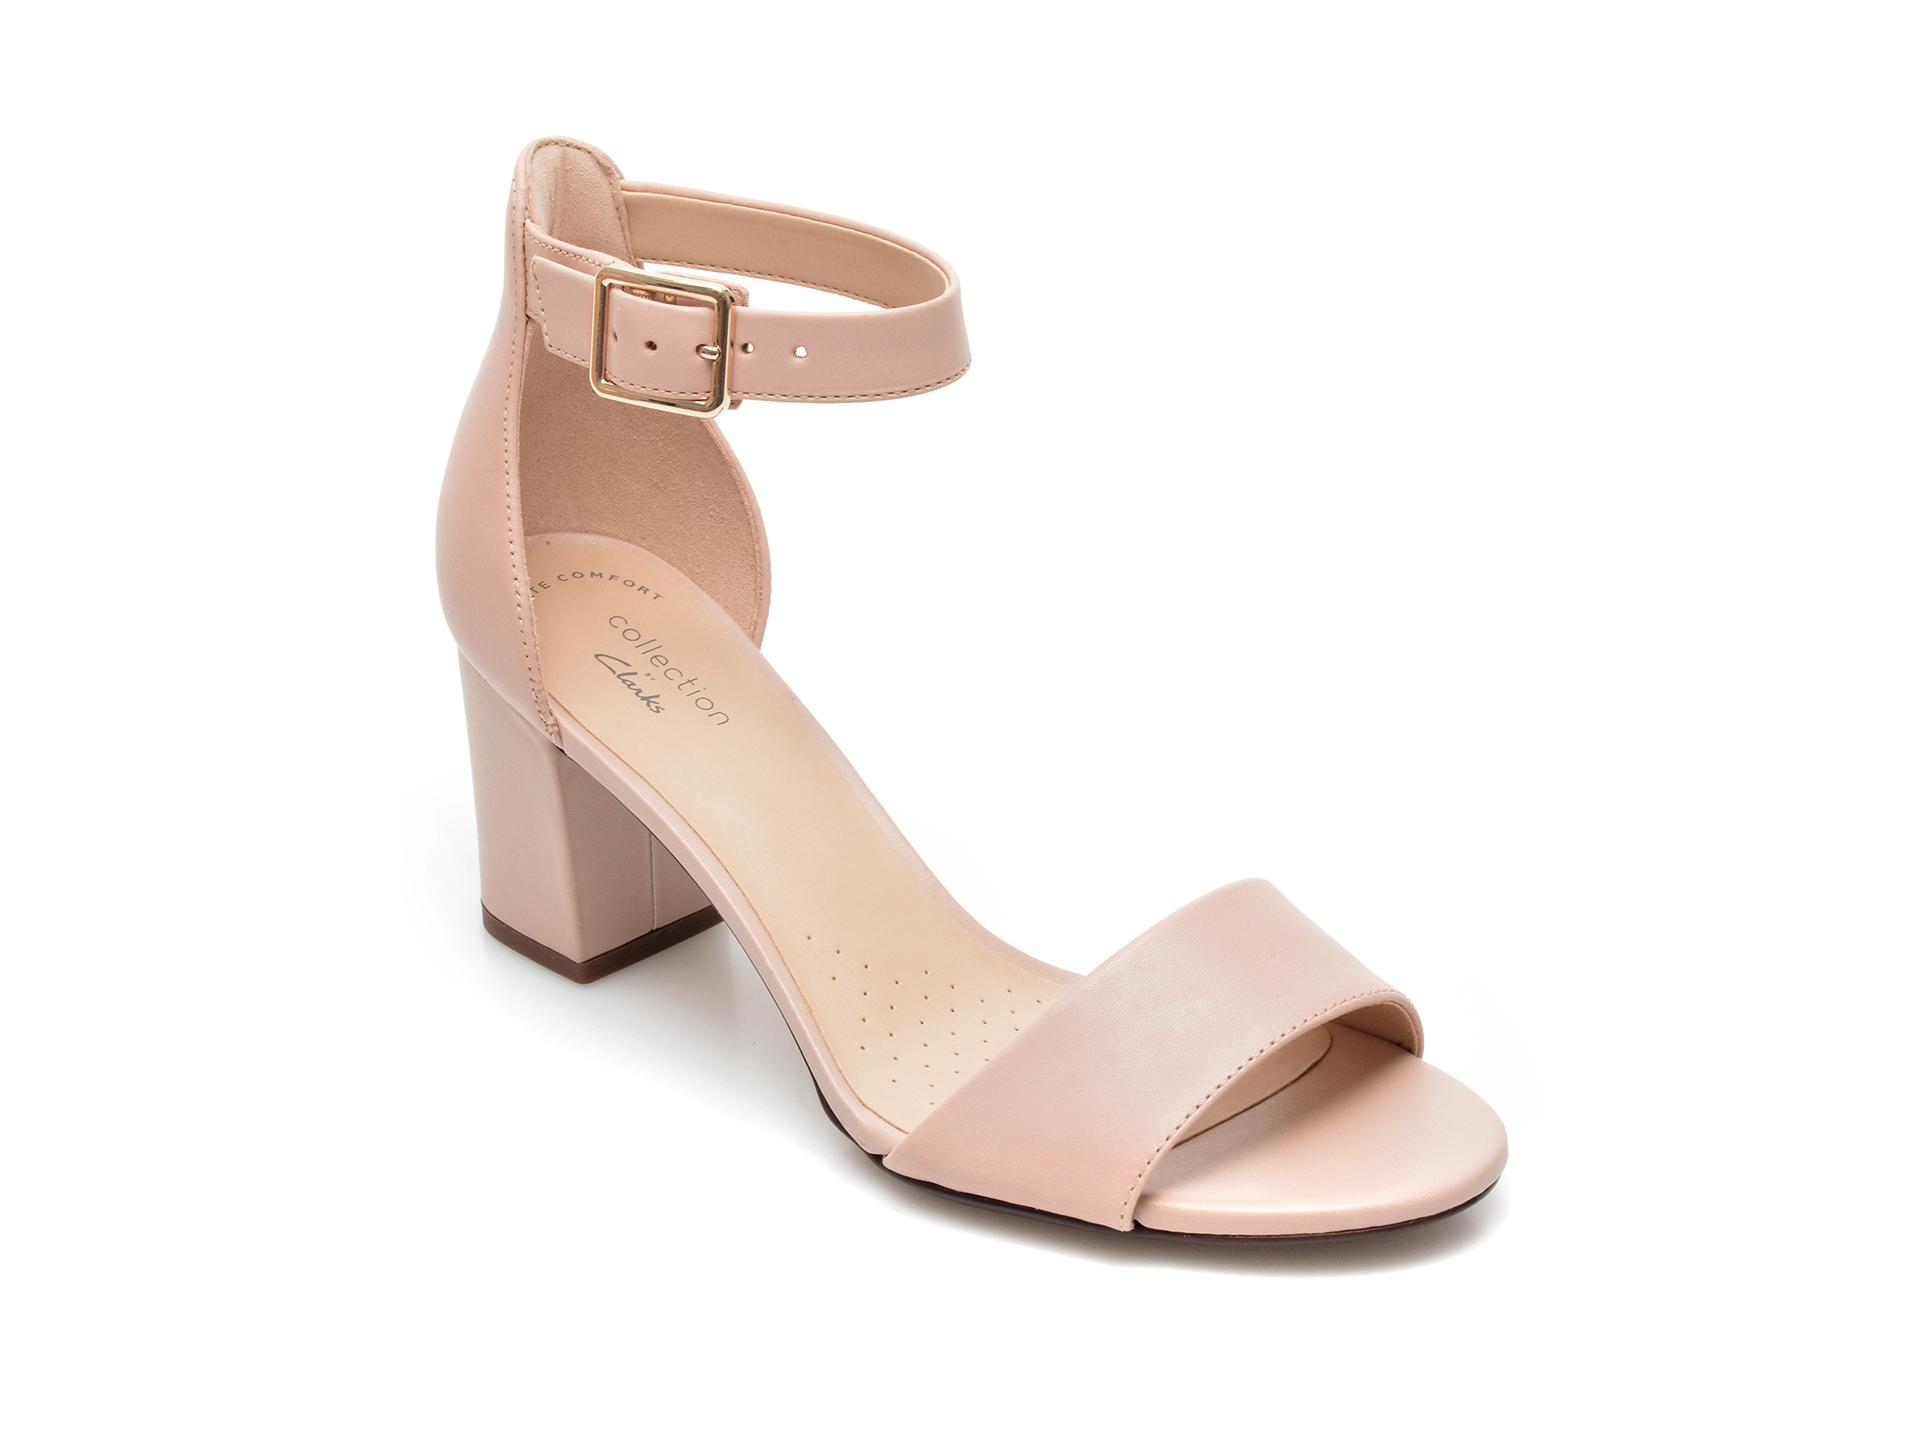 Sandale CLARKS nude, Deva Mae, din piele naturala imagine otter.ro 2021